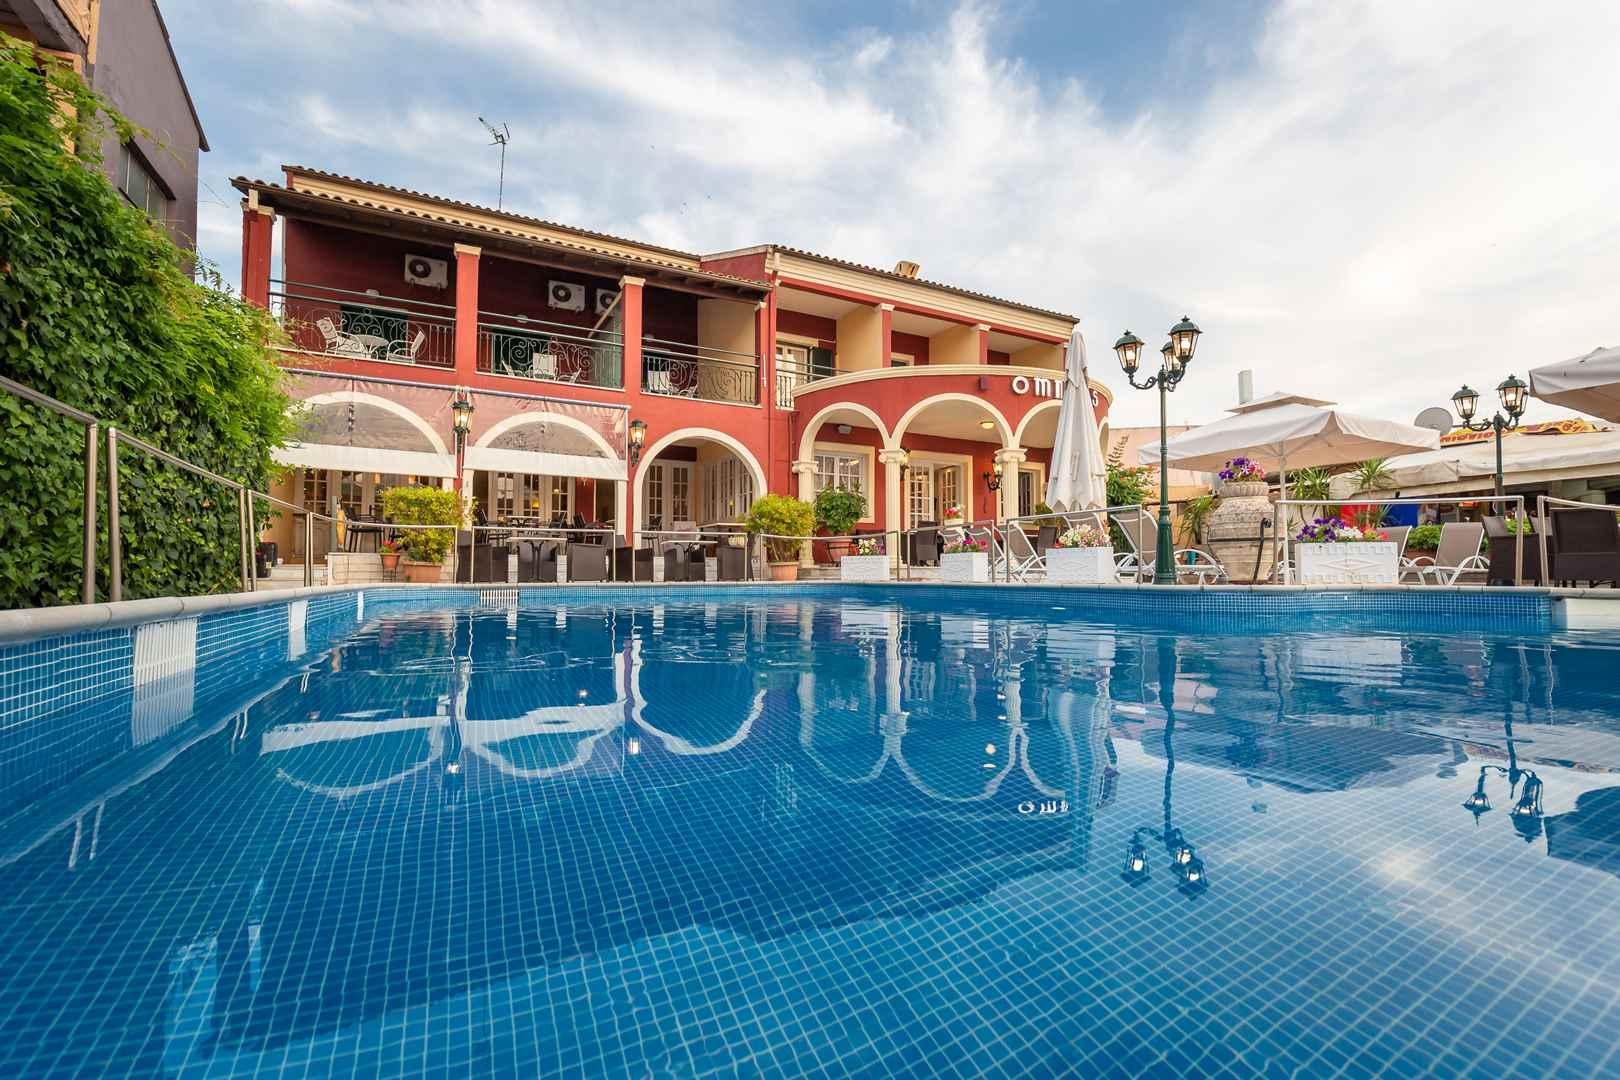 Omiros Hotel, Pool Area